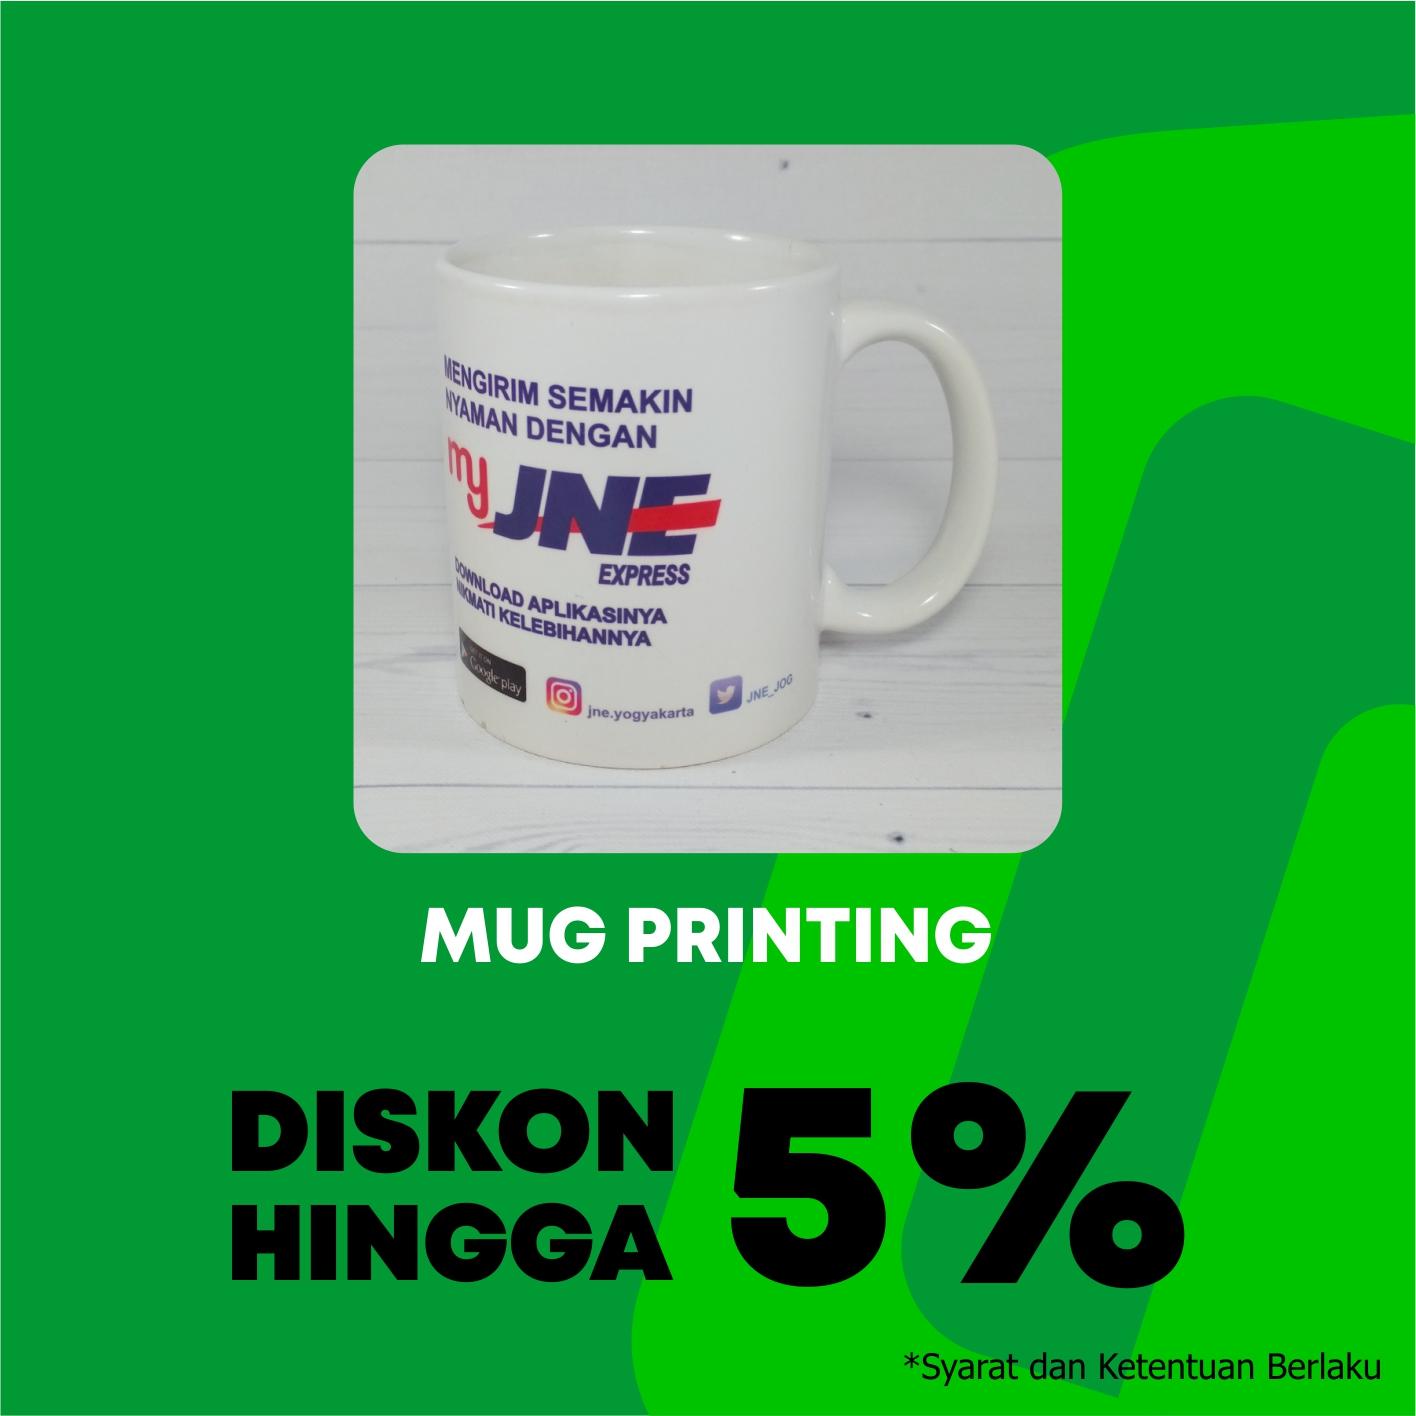 Promo Diskon Hingga 5% Mug Printing